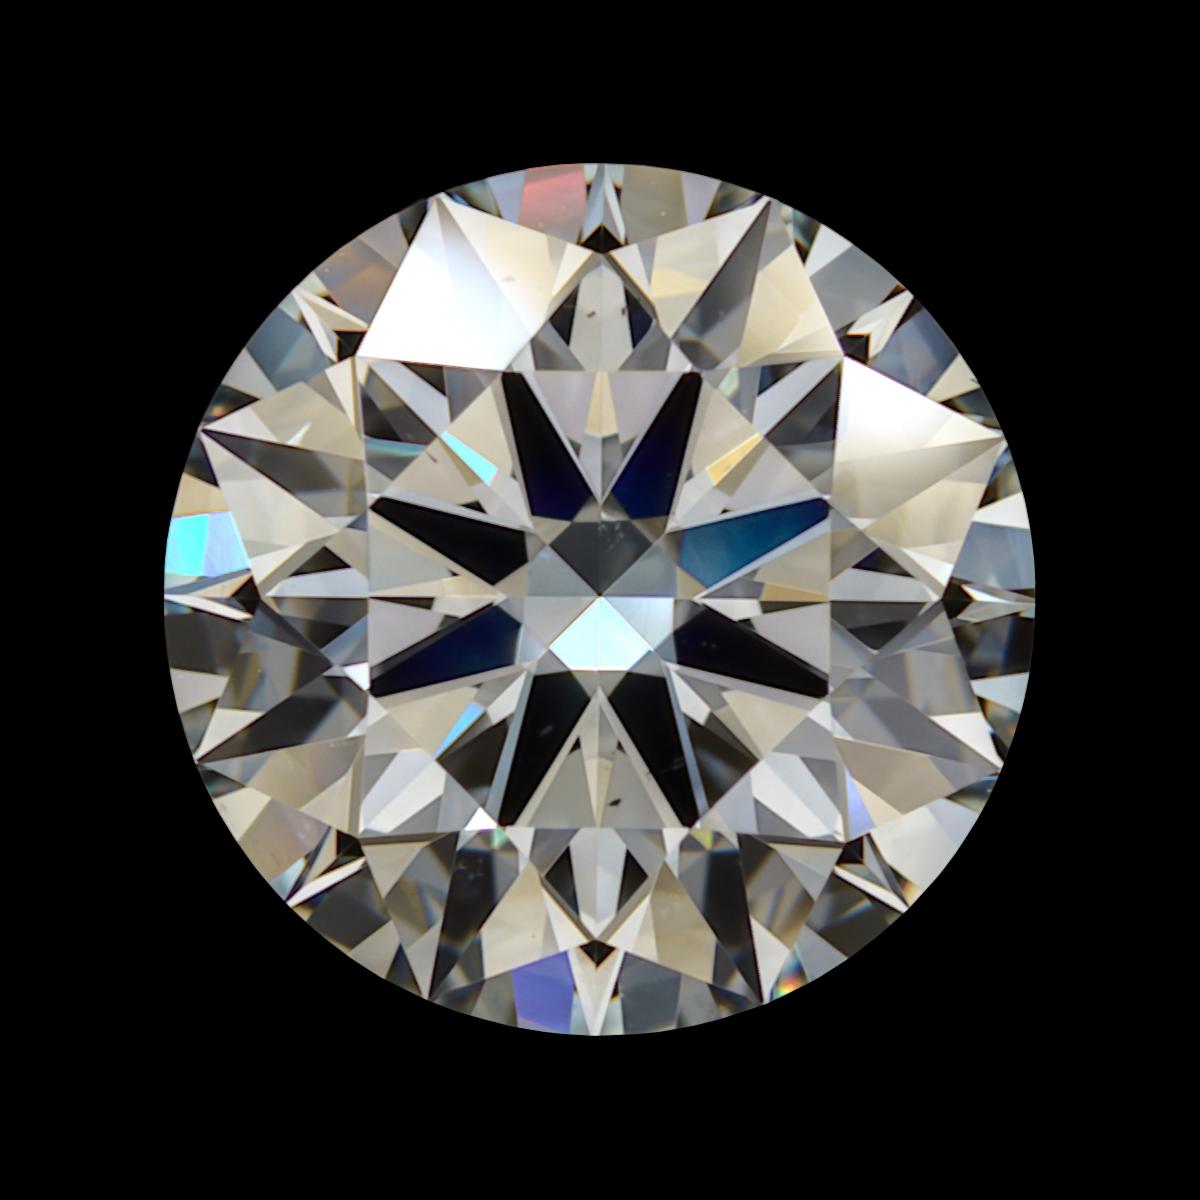 https://cdn.briangavindiamonds.com/files/mp4/AGS-104114551013/AGS-104114551013-Office-02.mp4